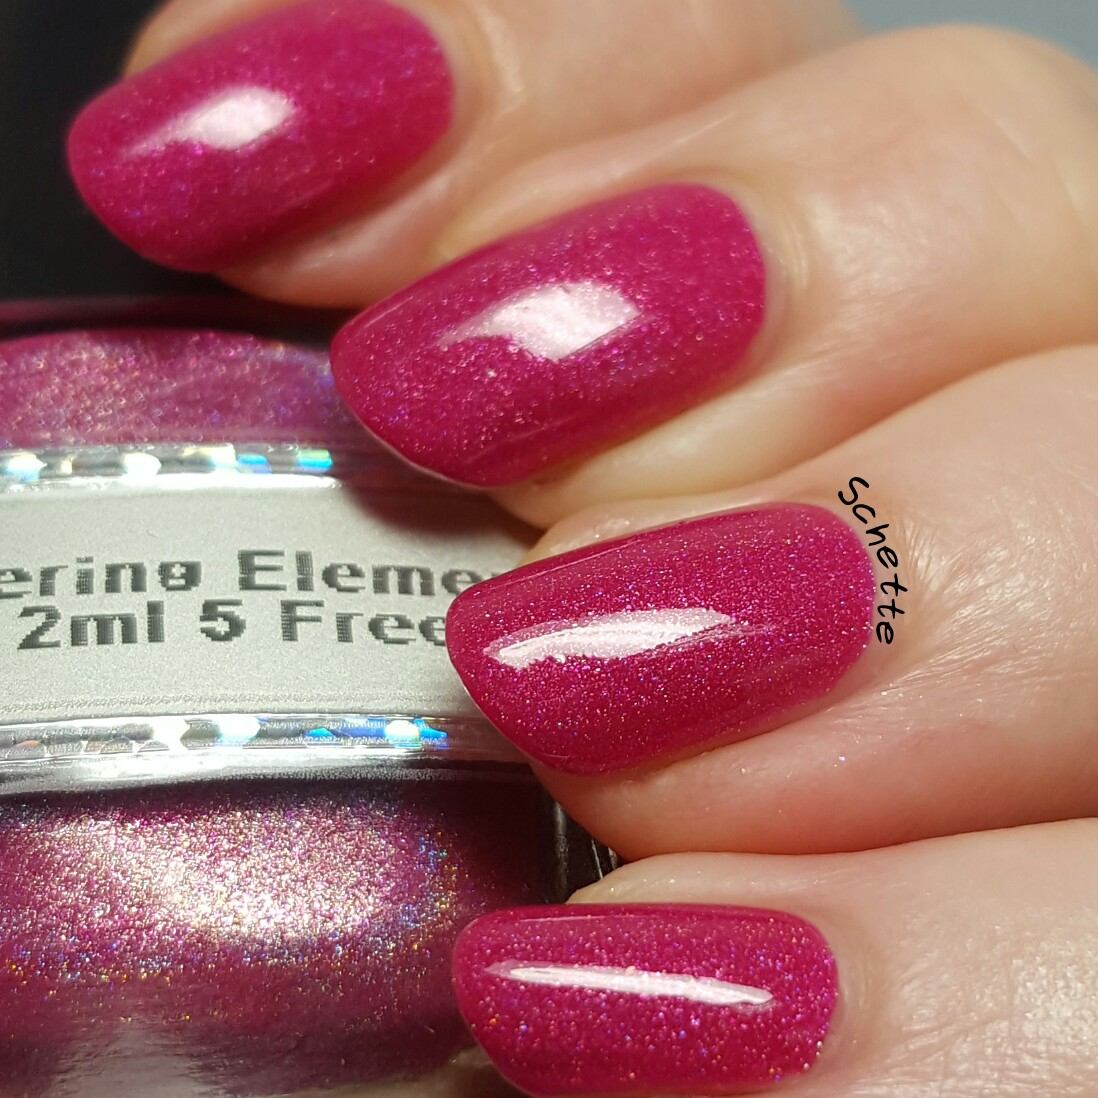 Glittering Elements - Love